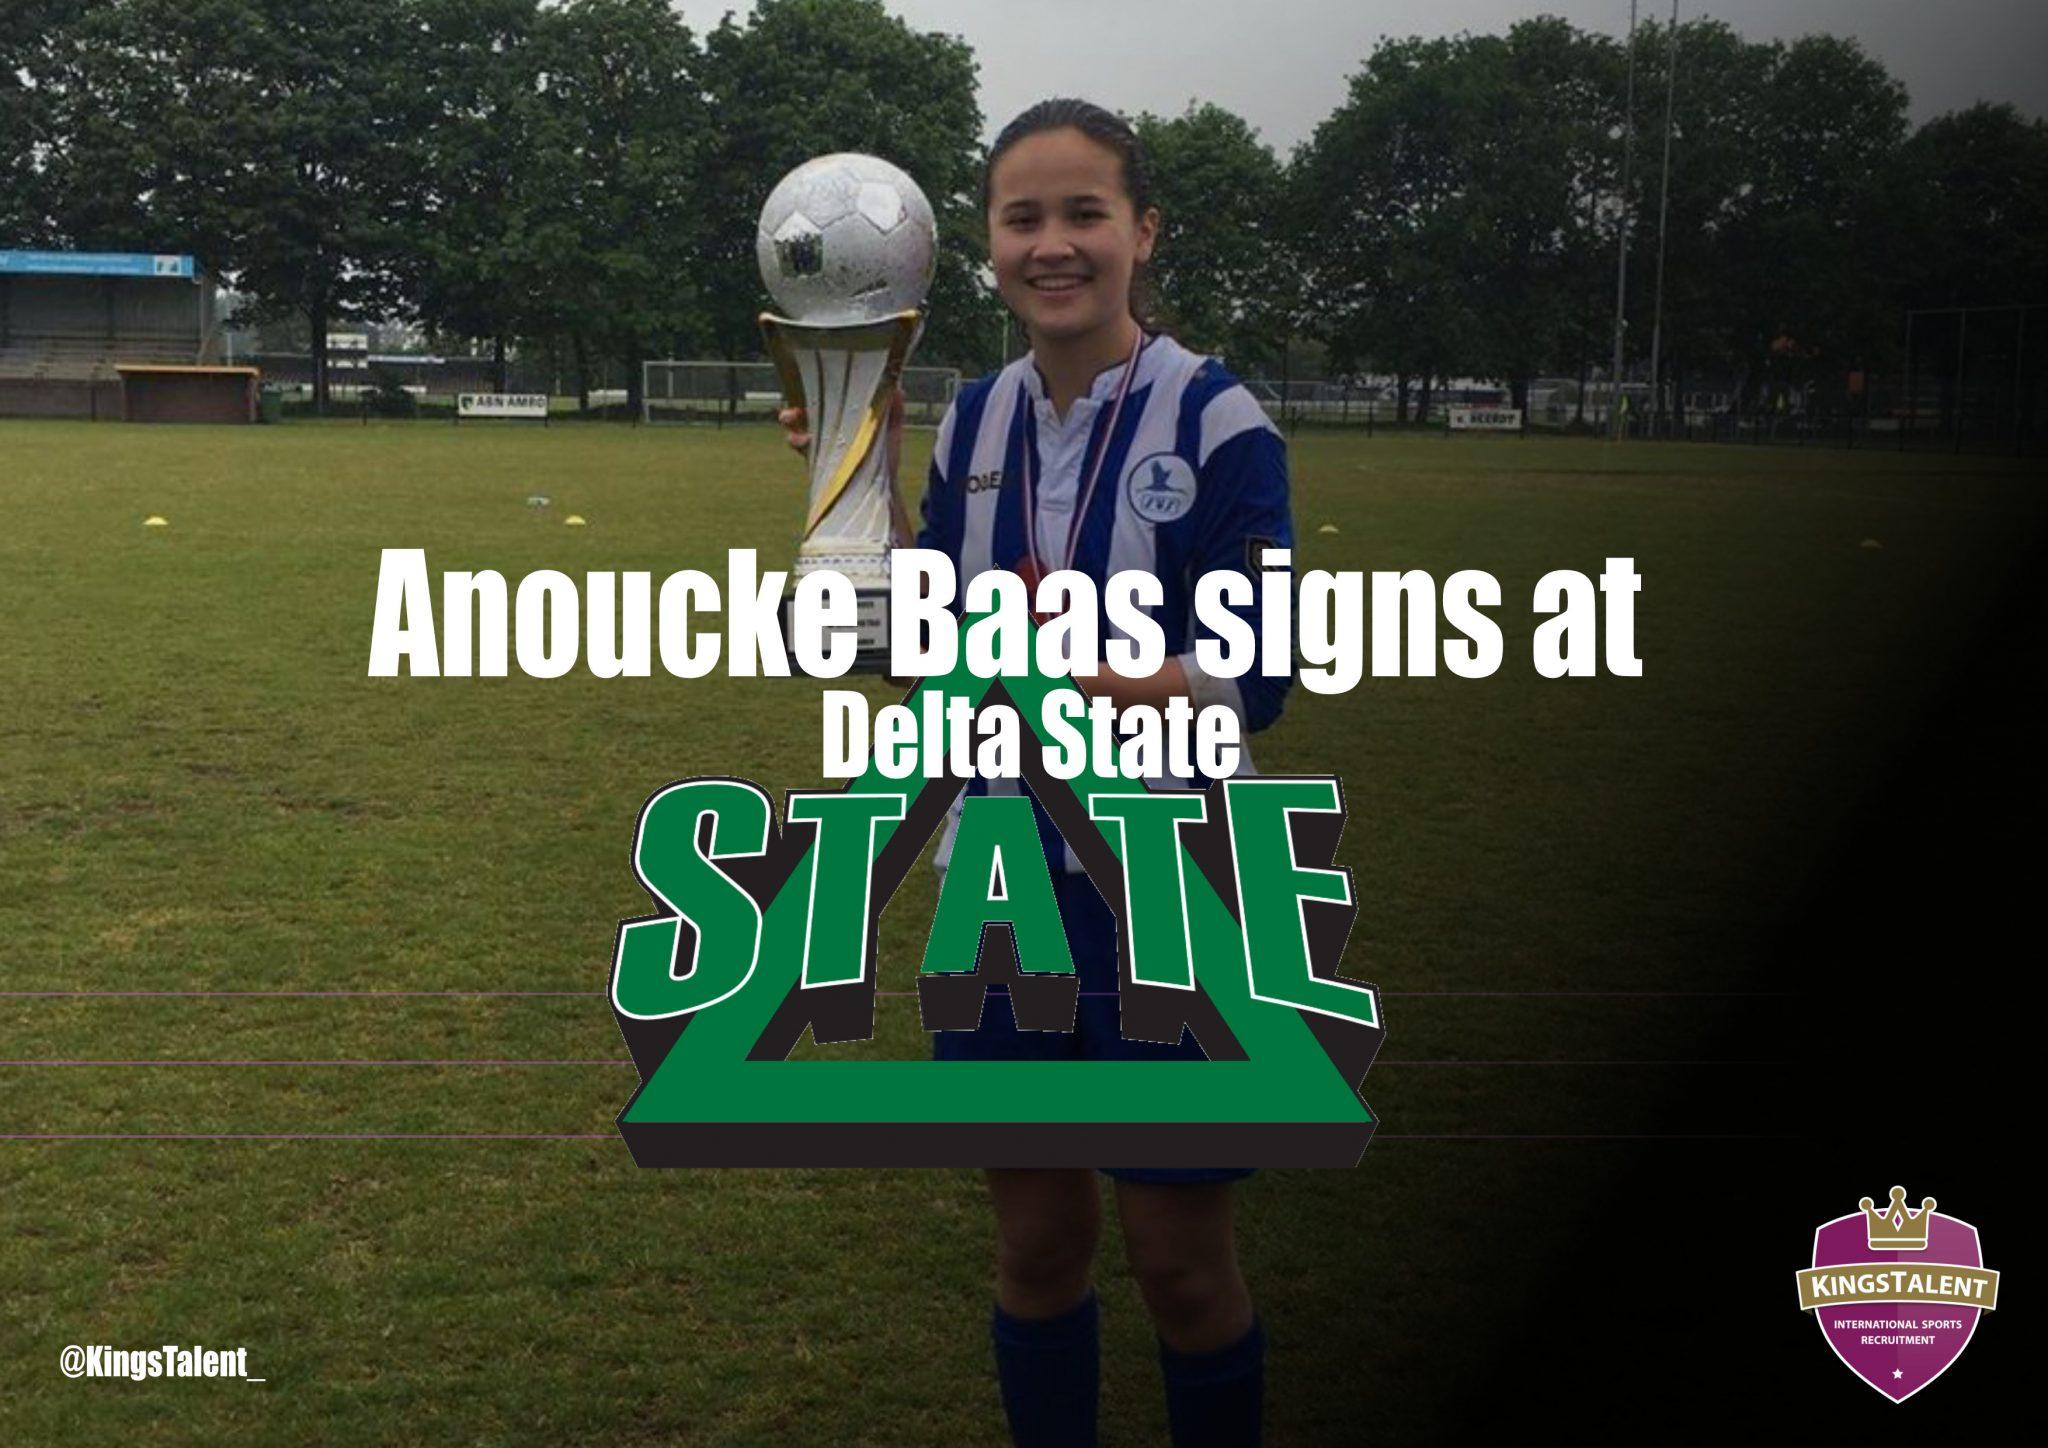 Anoucke Baas signs at Delta State